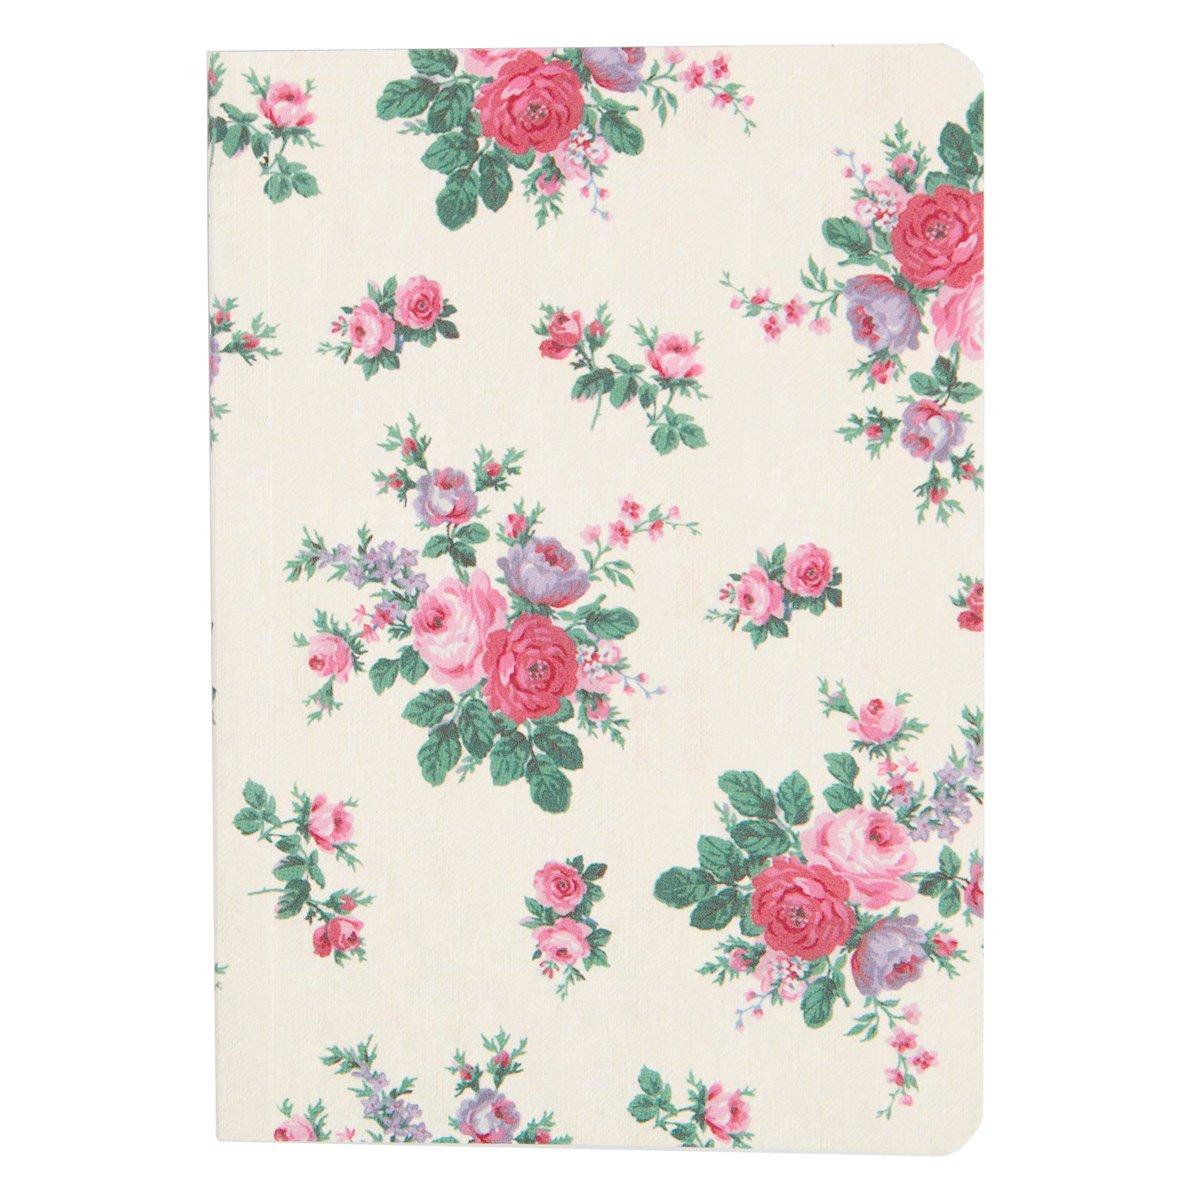 Vintage Floral A5 Paperback Notebook - £3.99   https://www. shopafrolics.co.uk/ourshop/prod_5 558870-Vintage-Floral-A5-Notebook.html &nbsp; …   #eshopsuk #ukhashtags #uksmallbiz #ukbiz #sbutd<br>http://pic.twitter.com/RtziakuoWq